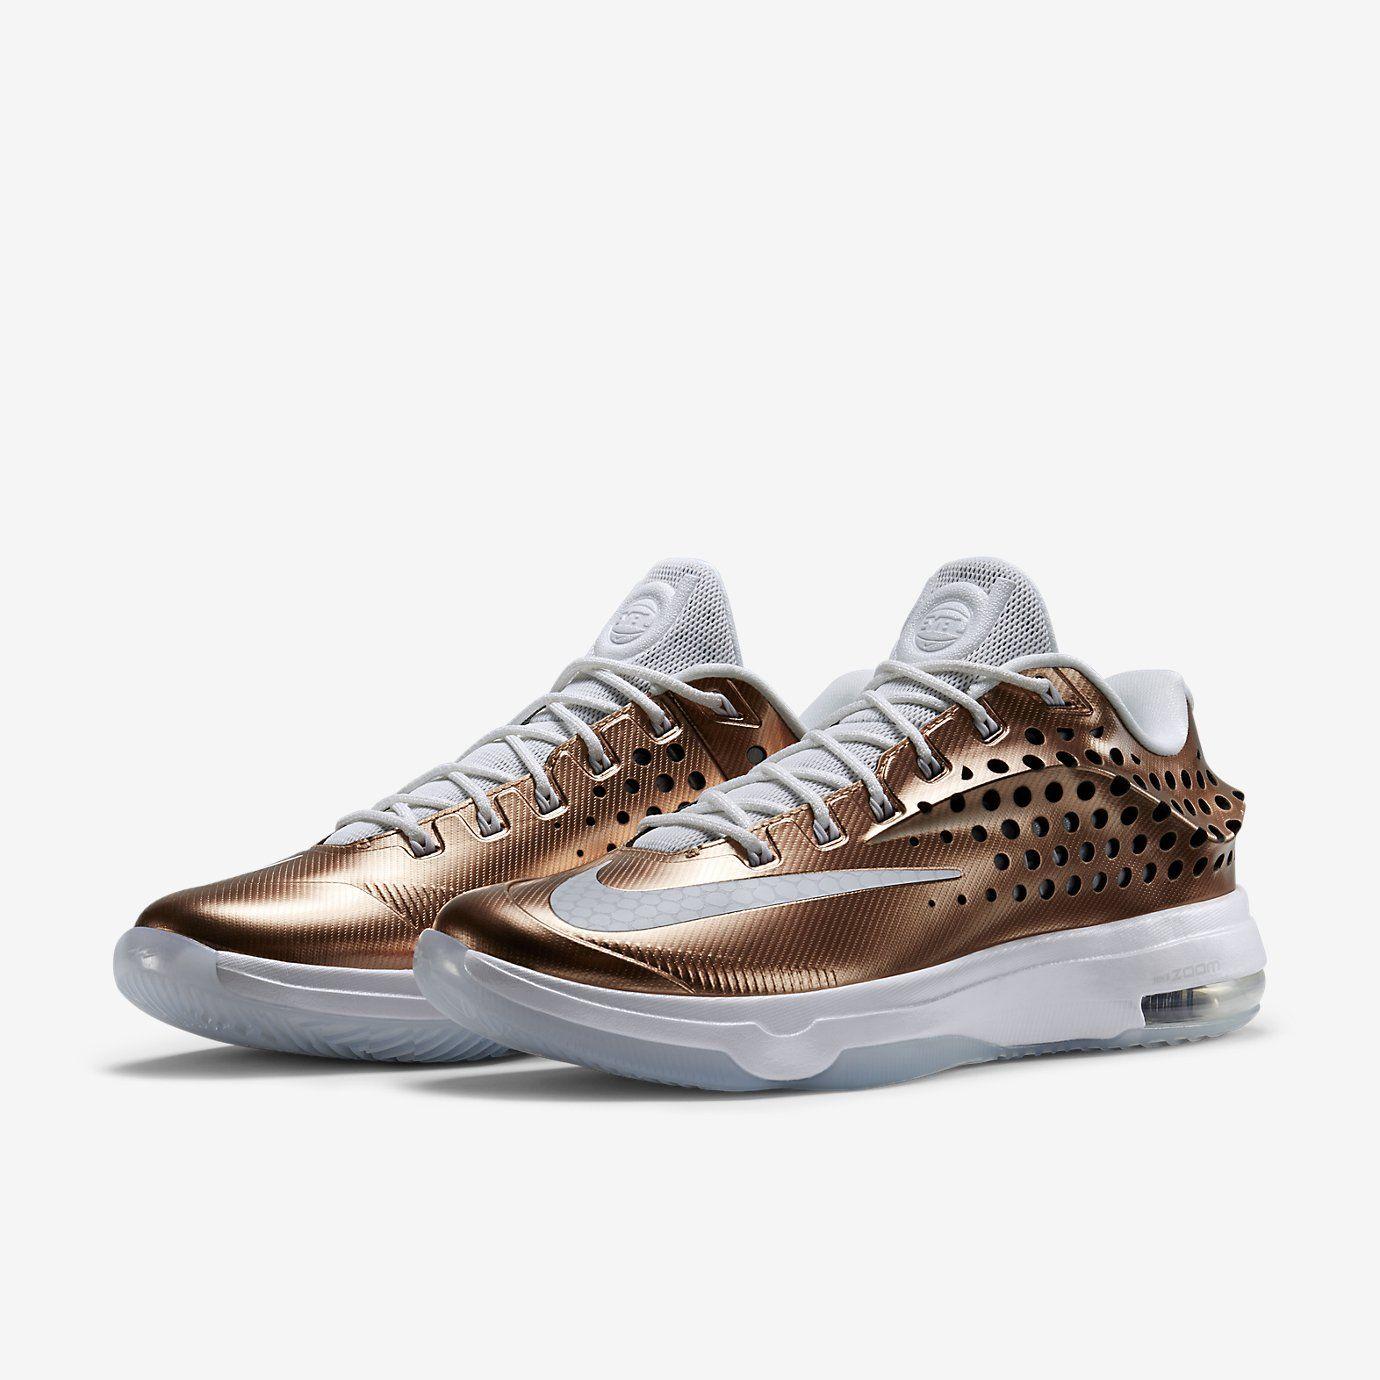 wholesale dealer c3c5c 08721 KD VII Elite EYBL Men s Basketball Shoe. Nike Store